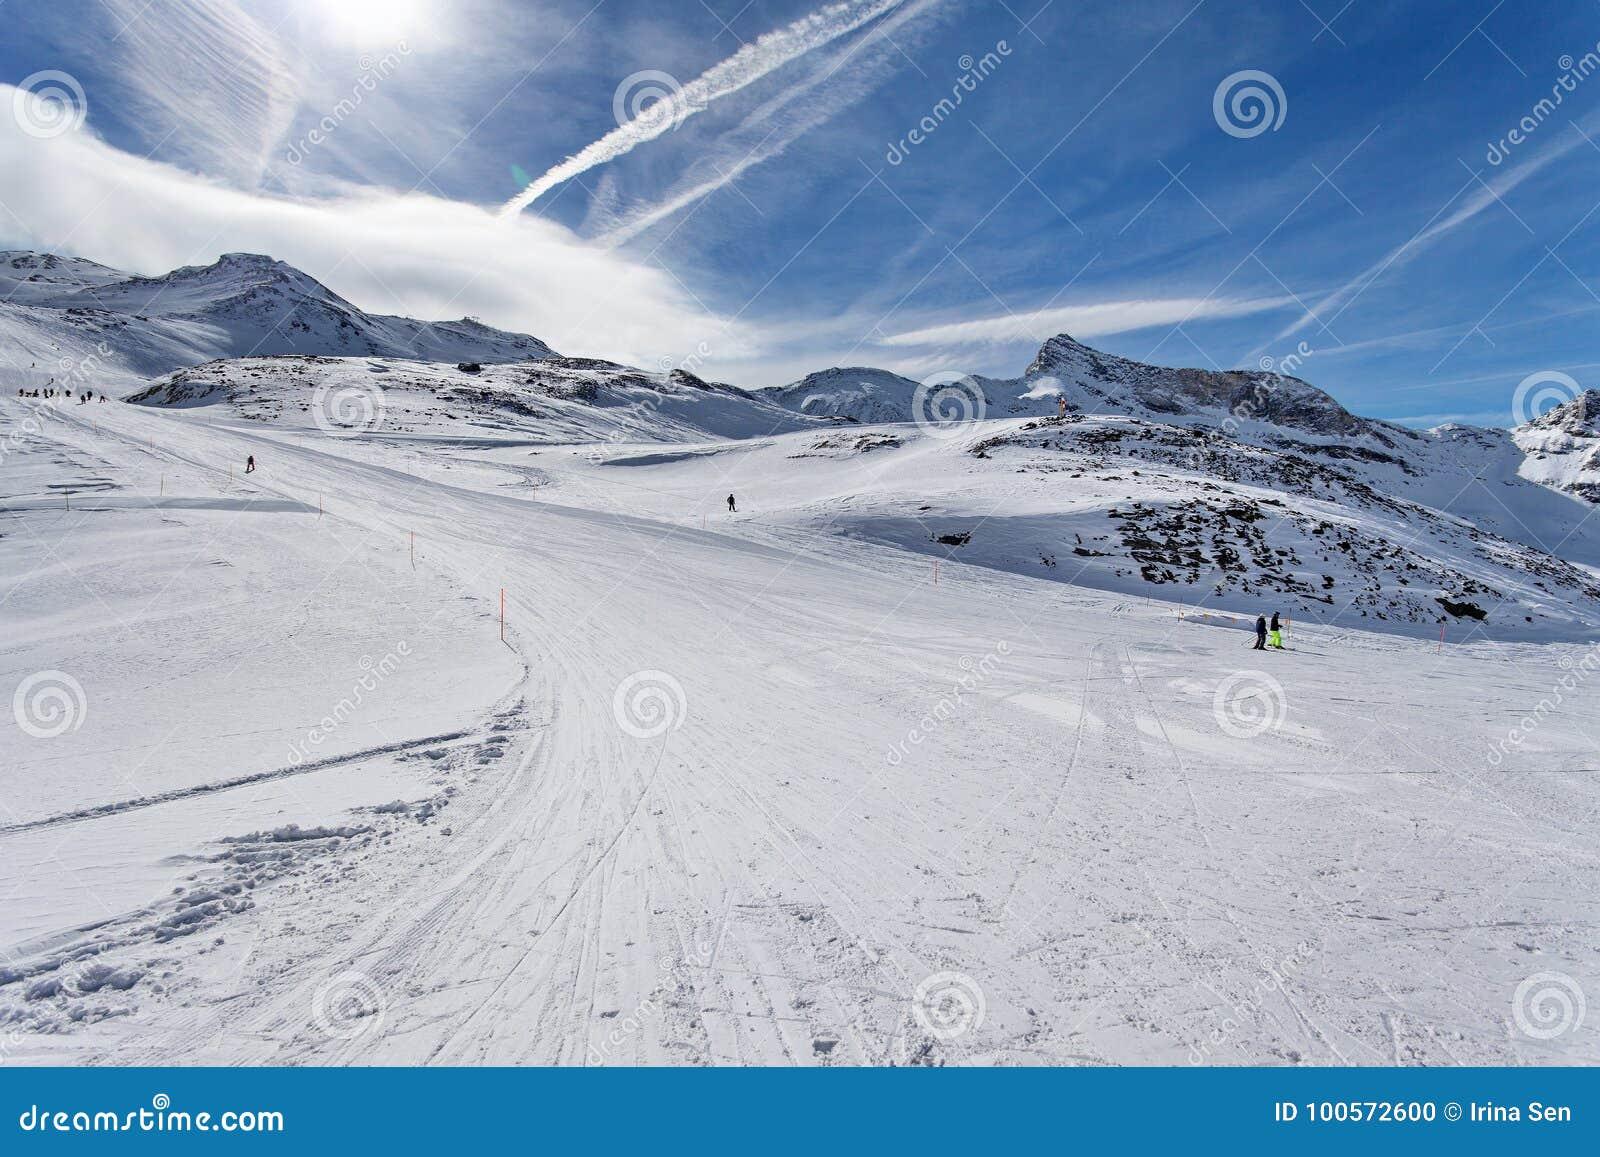 Ski Cervinia 2018 2019 - Book Skiing Holidays in Cervinia